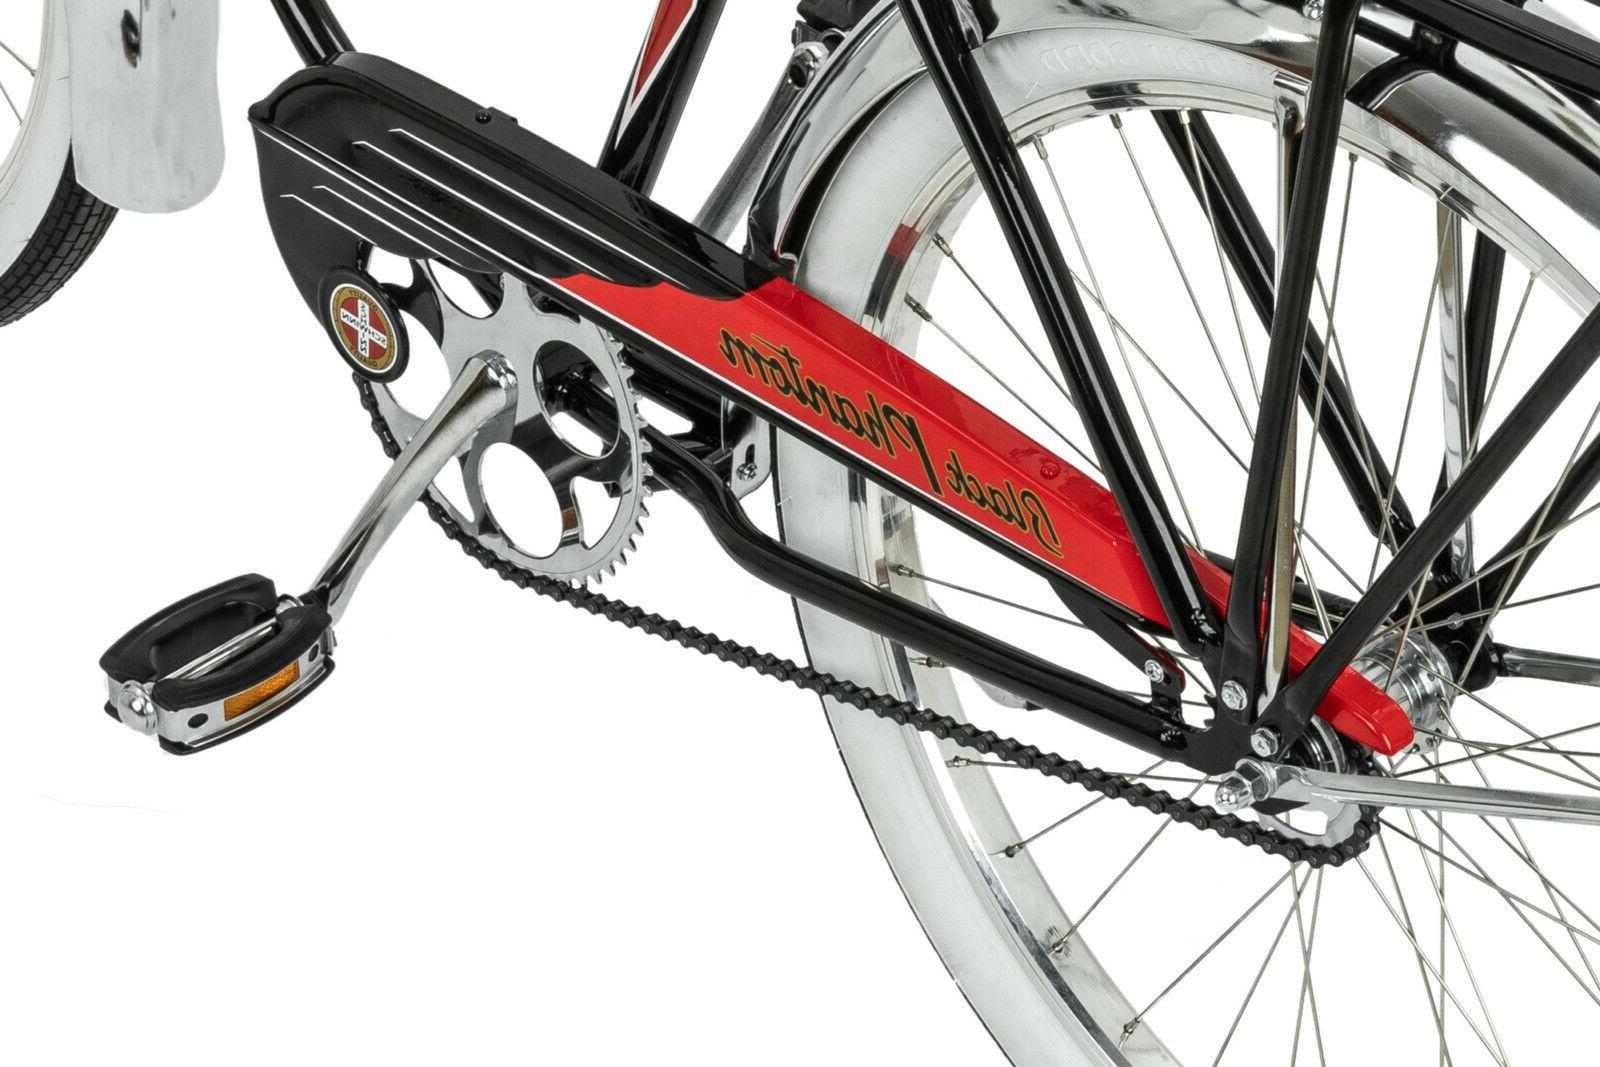 Schwinn Black Bike, single speed,